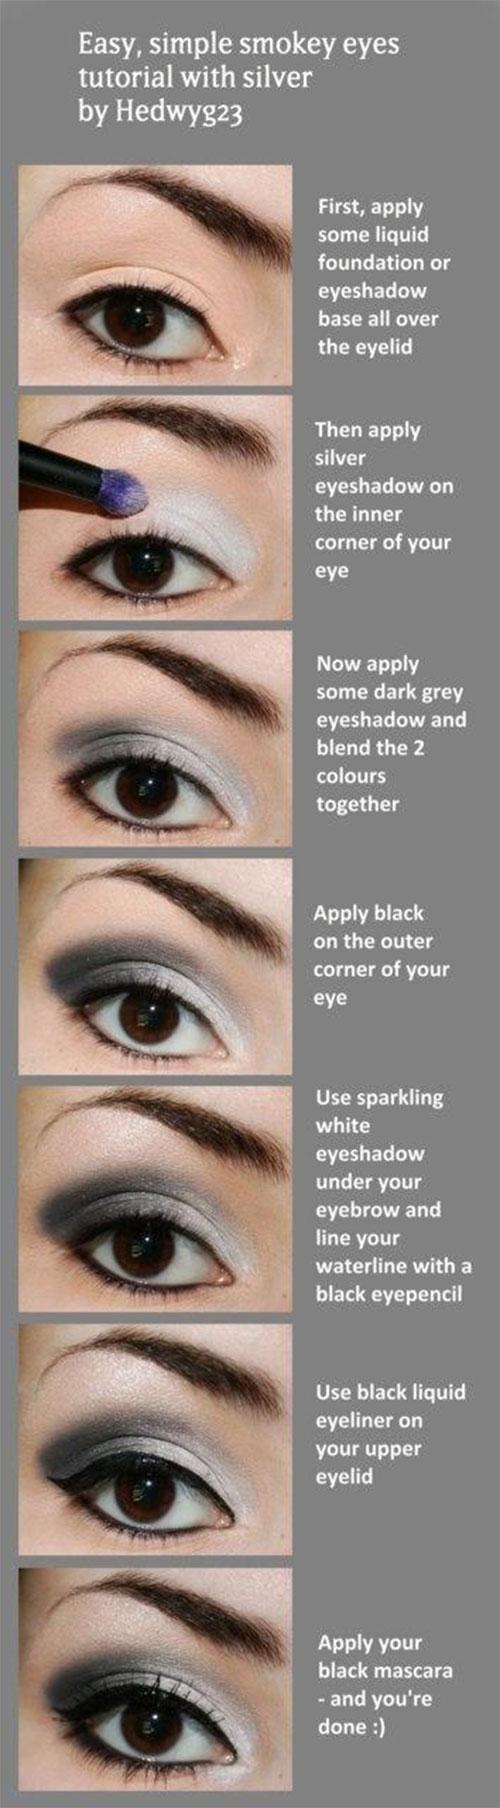 20-Happy-New-Year-Eve-Eye-Makeup-Tutorial-2015-25